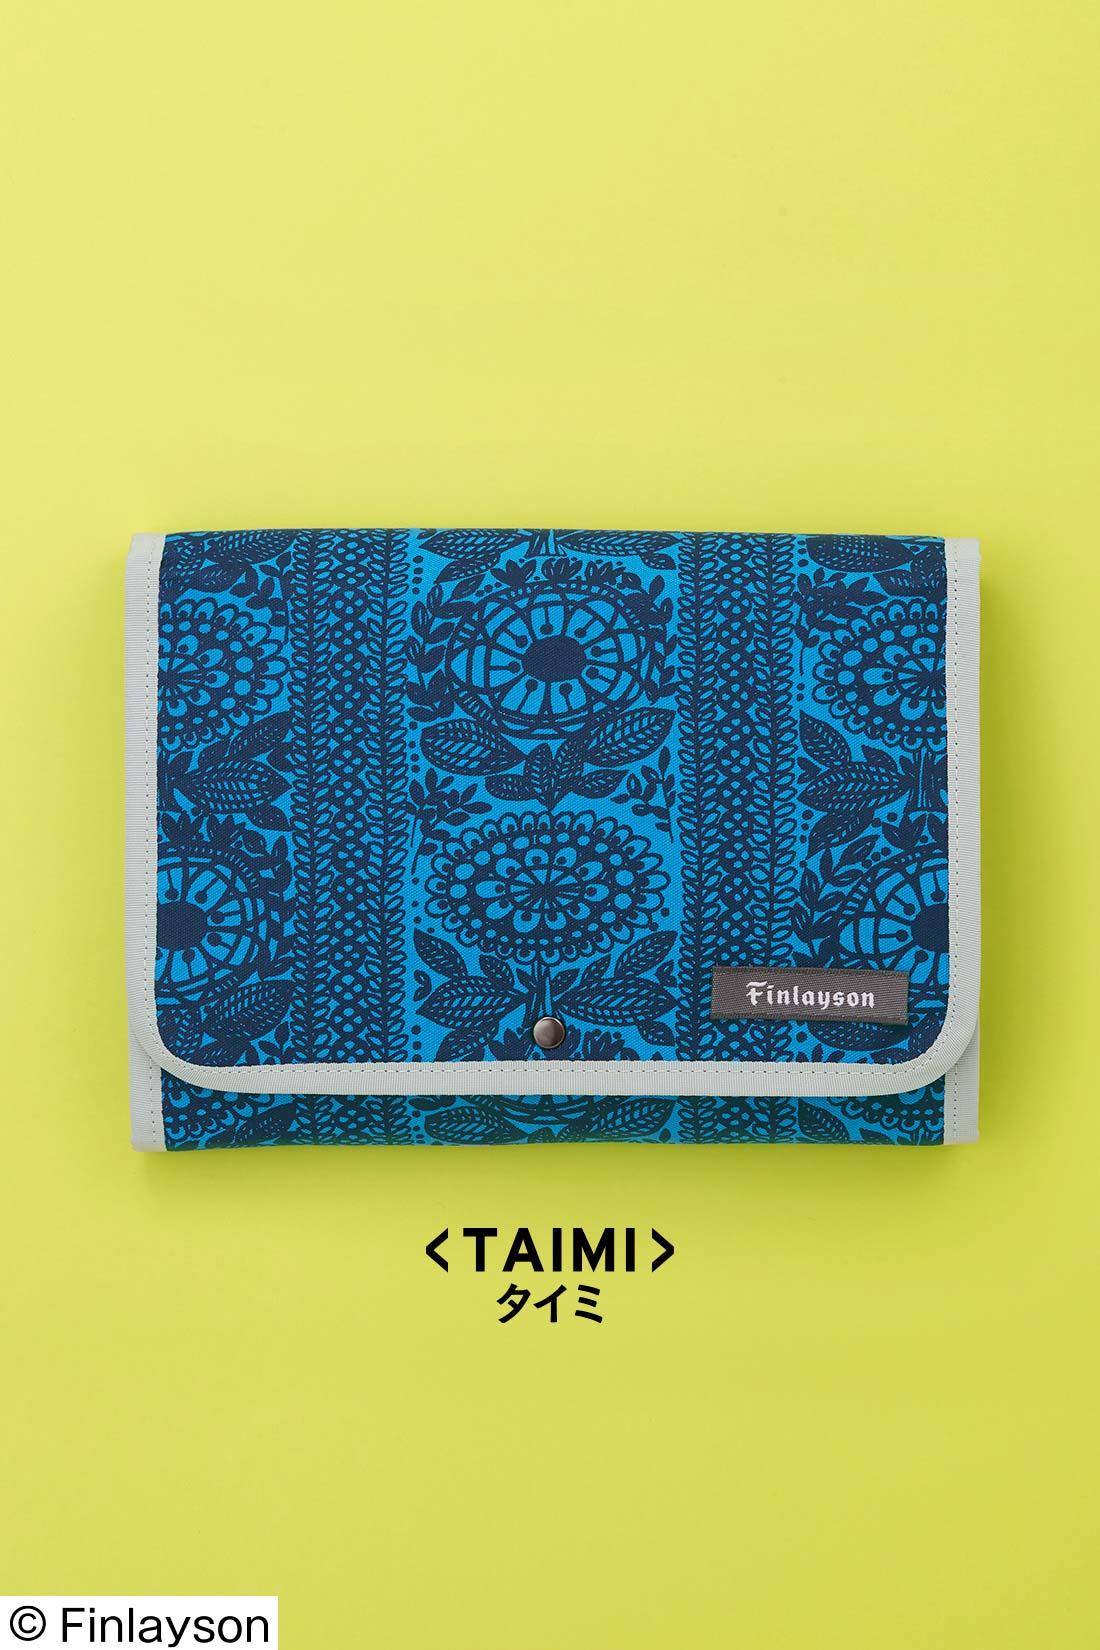 〈TAIMI〉タイミ 伝統的な花々、夕暮れに蒔く種、スラブの歌声。遠い記憶の中の情景。